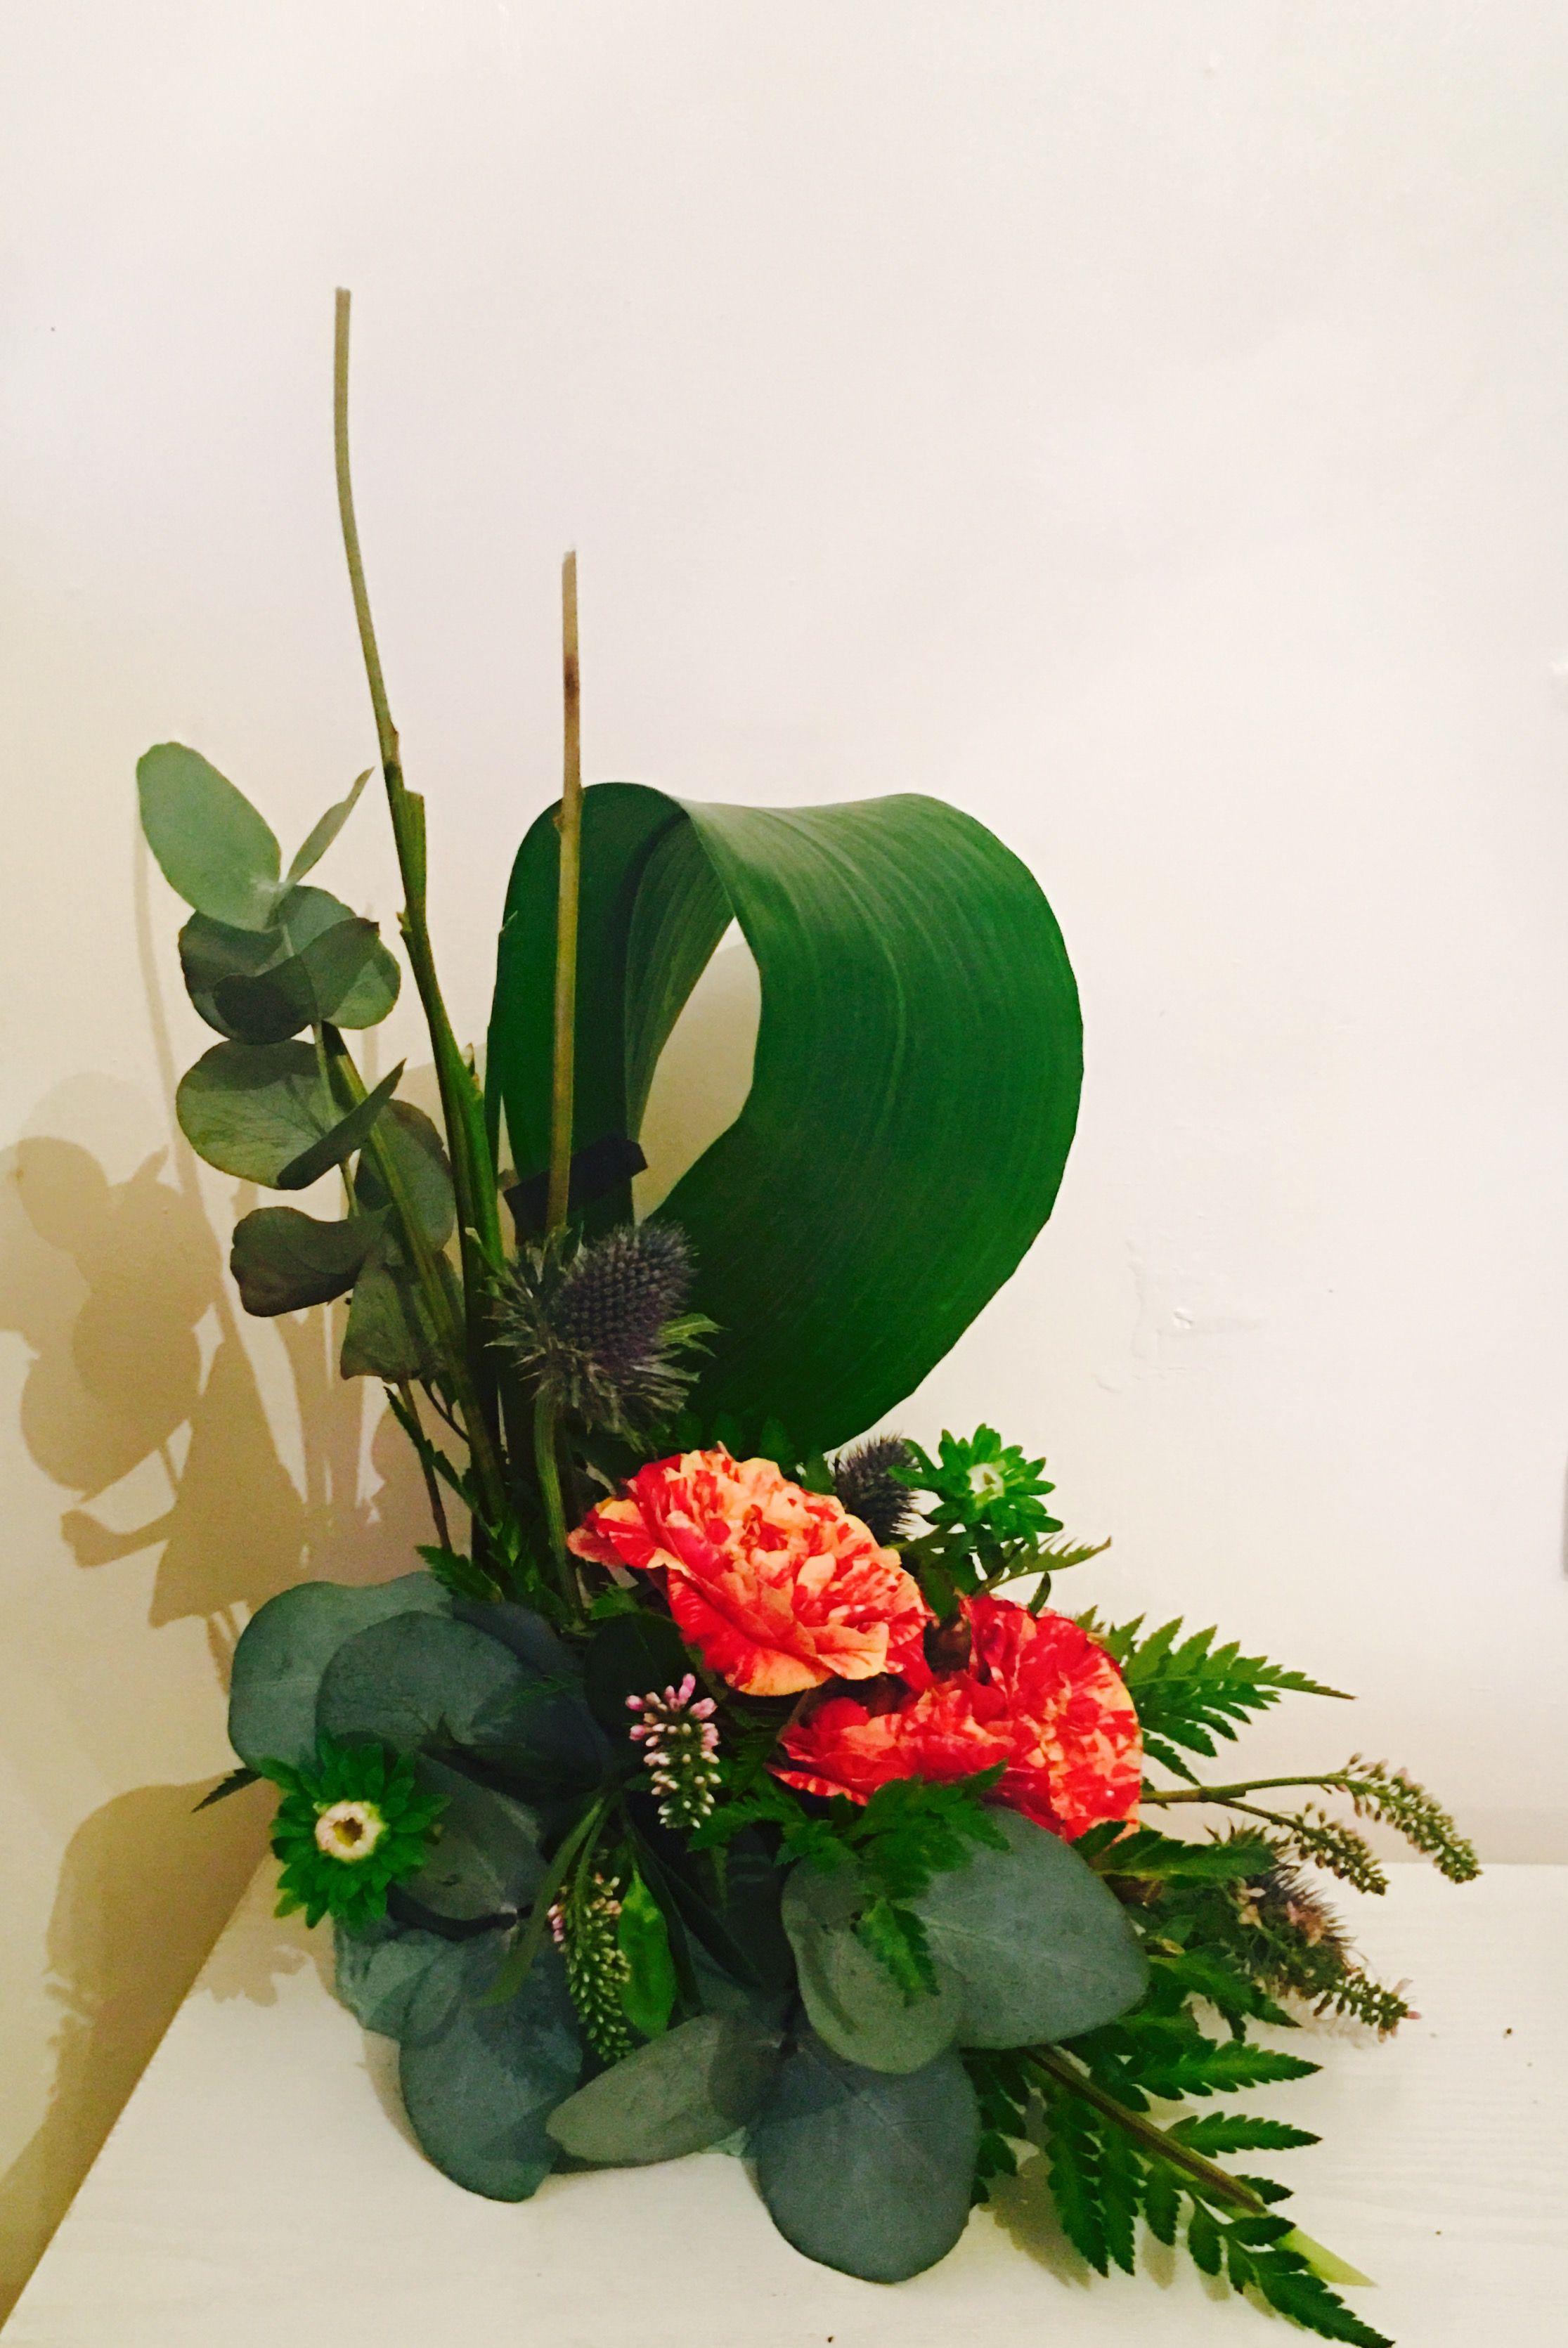 Pin de Maureen Osu en Flower Arrangements   Pinterest   Arreglos ...